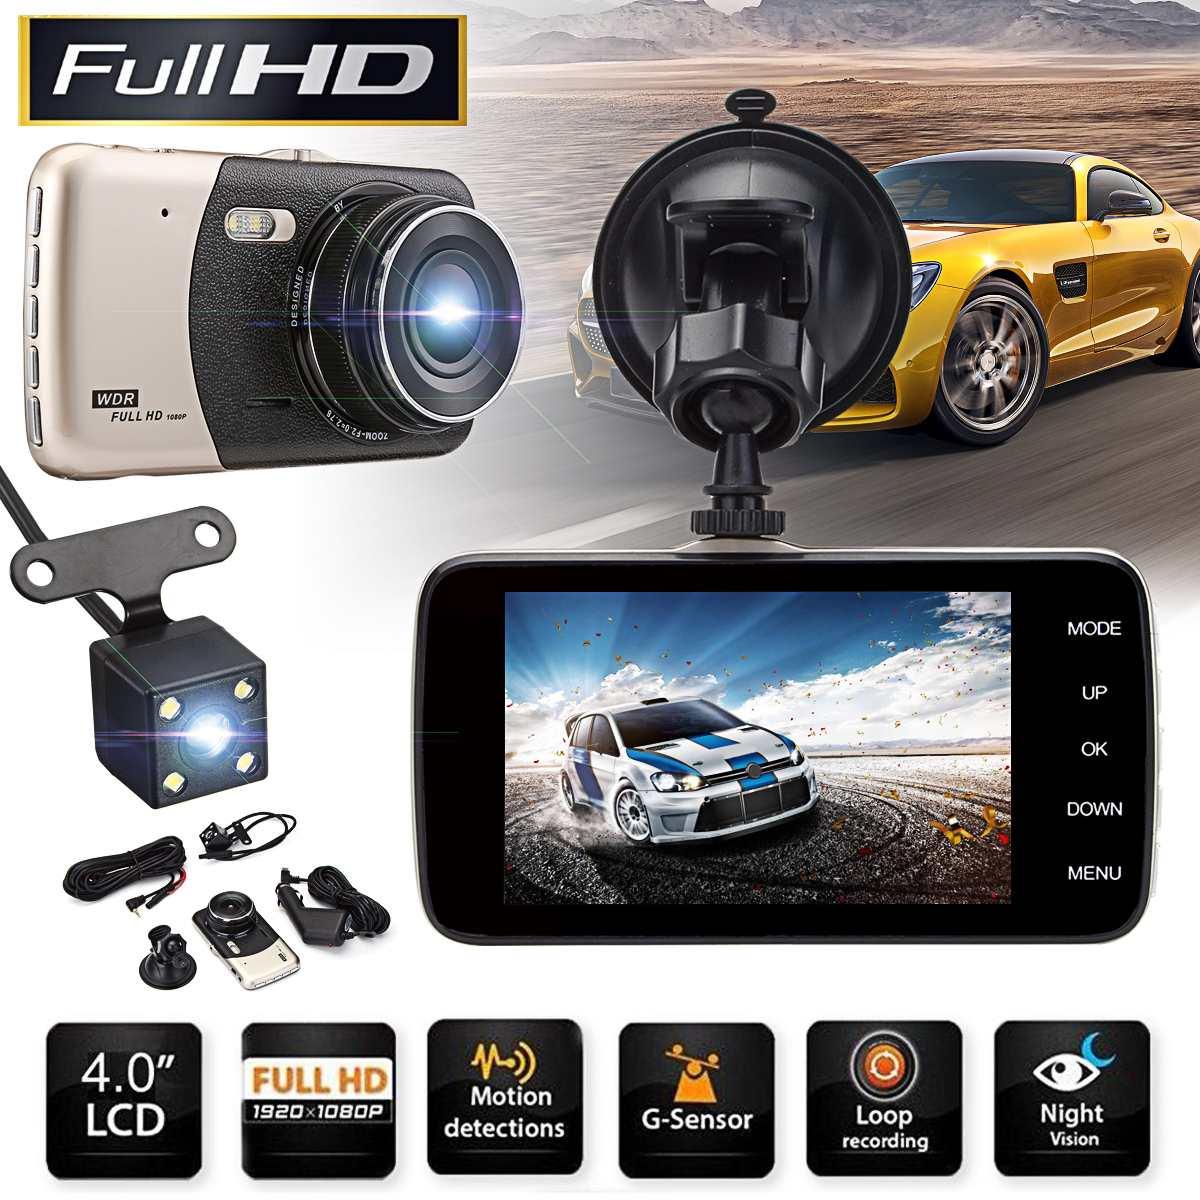 Video-Recorder Car-Dvr Dash-Camera Dual-Lens Night-Vision Full-Hd 4inch 1080P Dvrs Intelligent-System